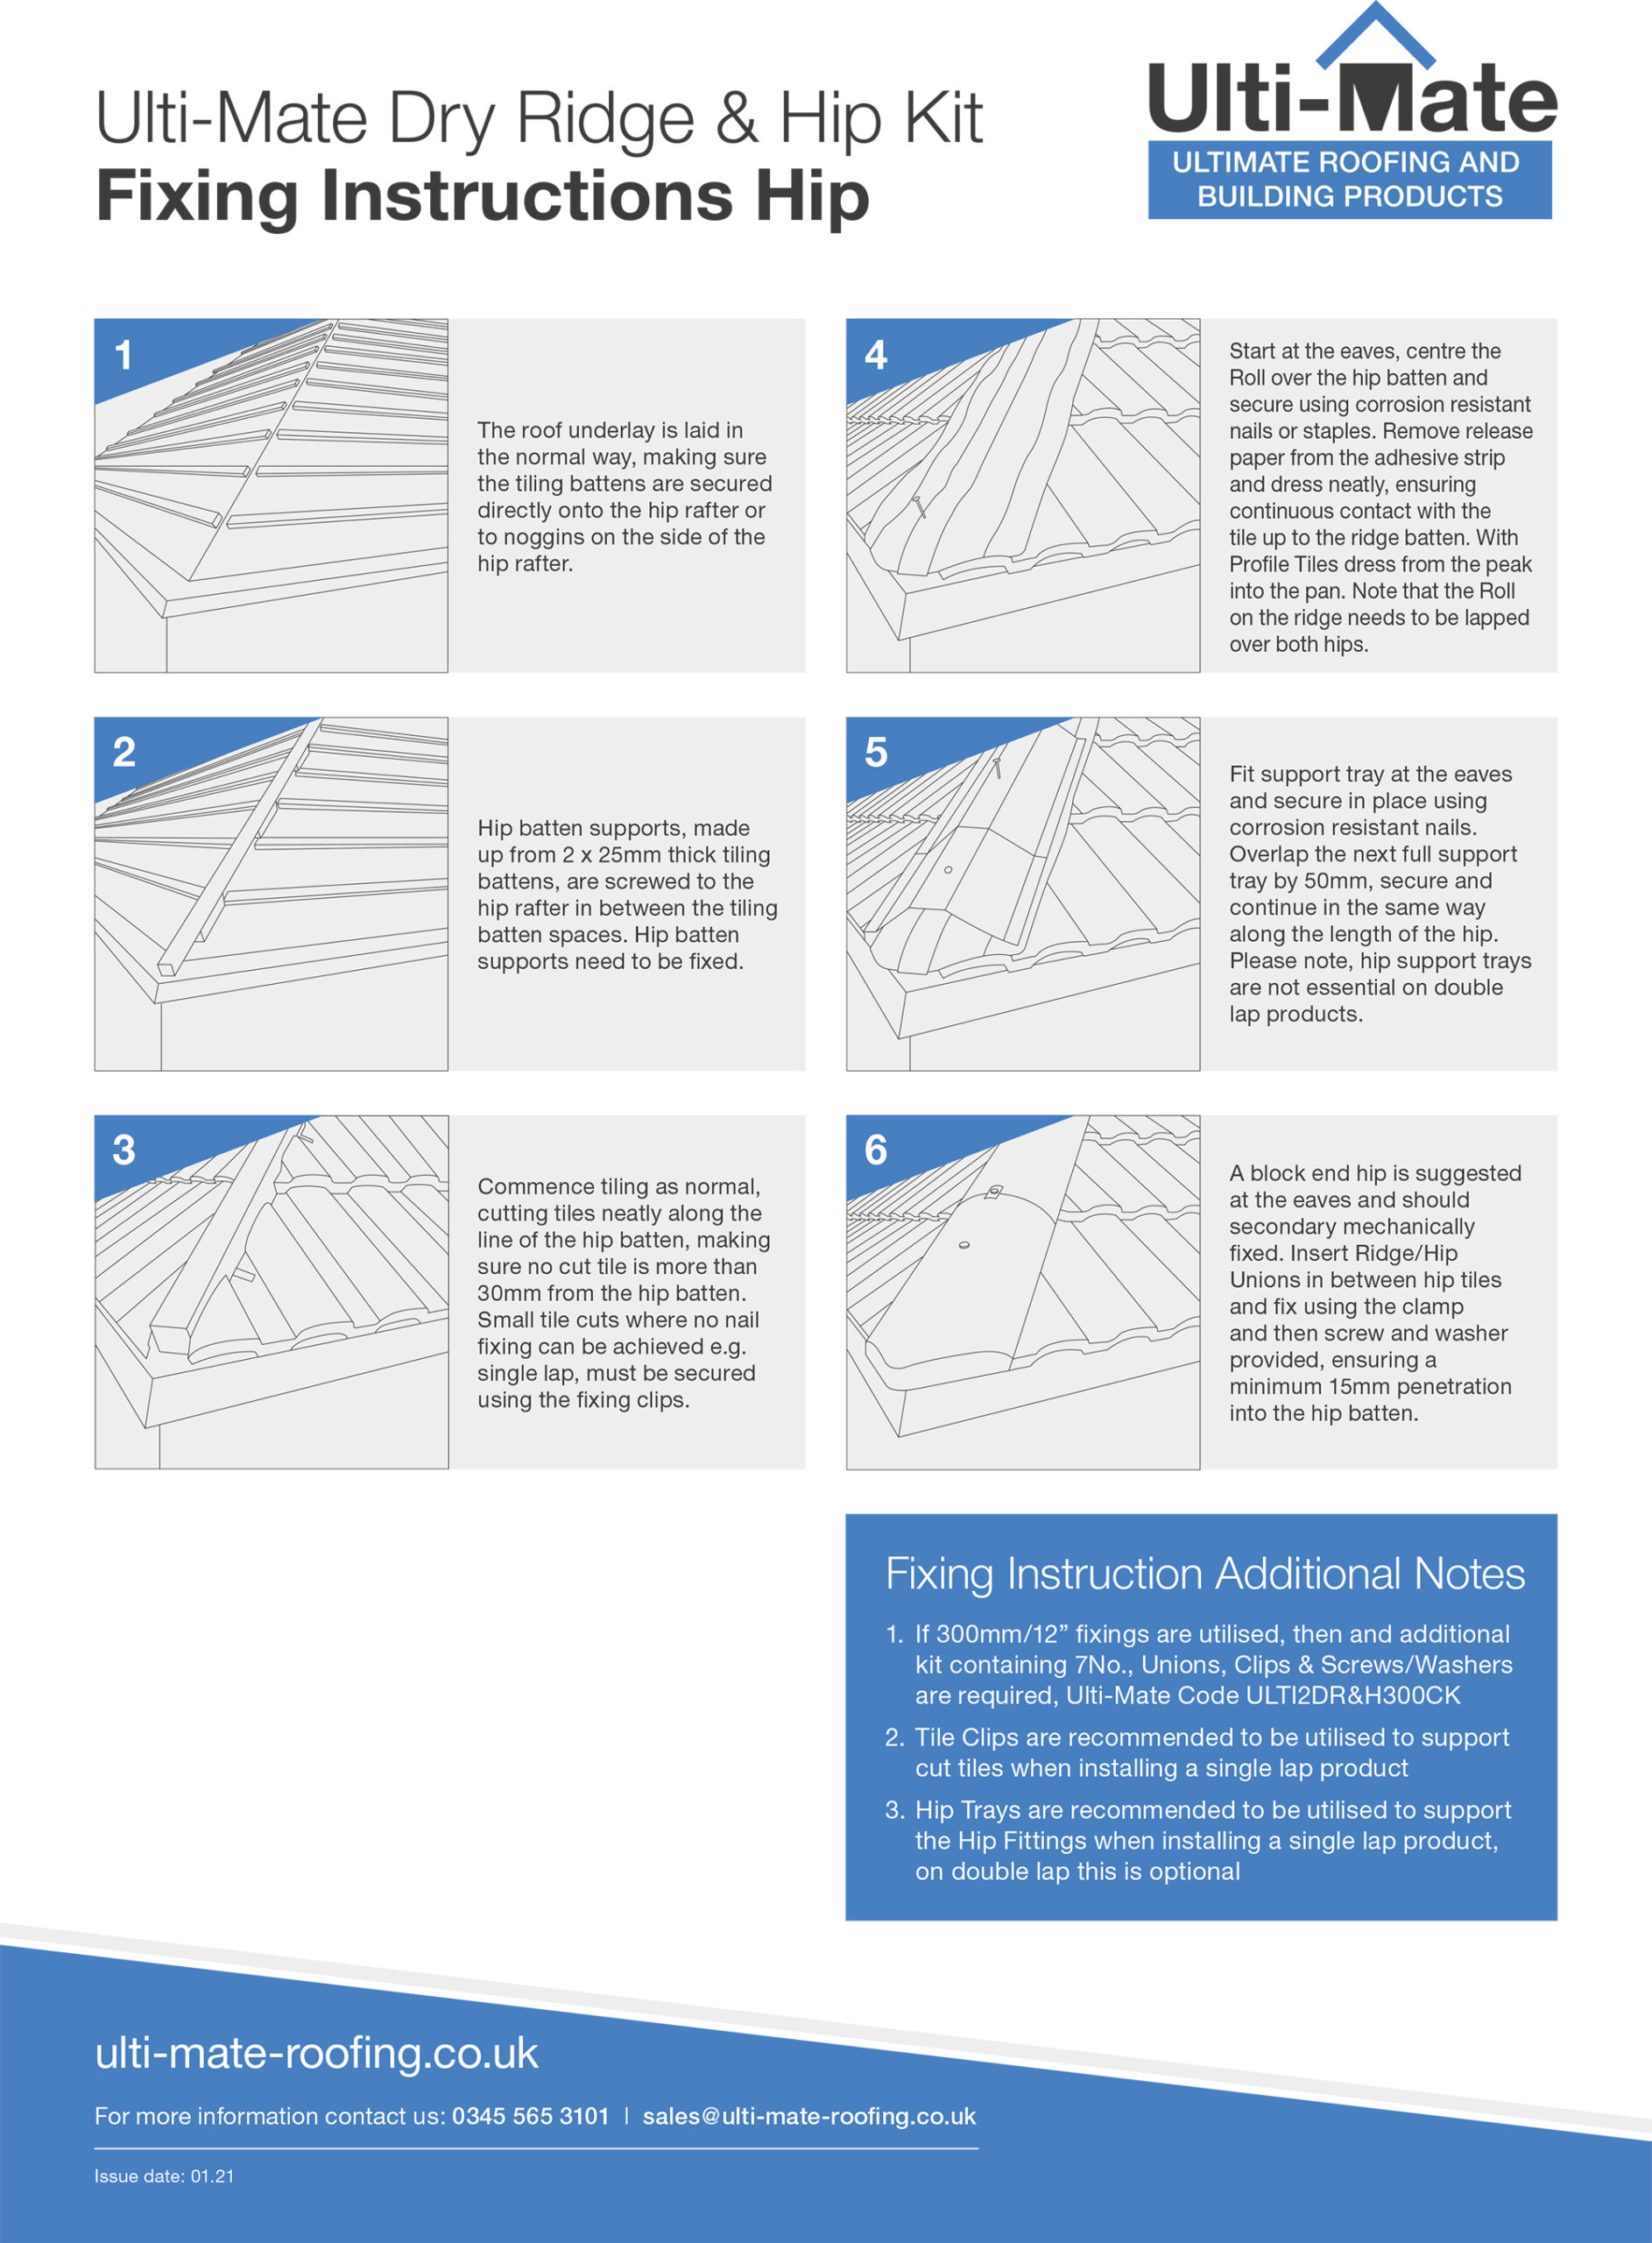 fixing-instructions-hip